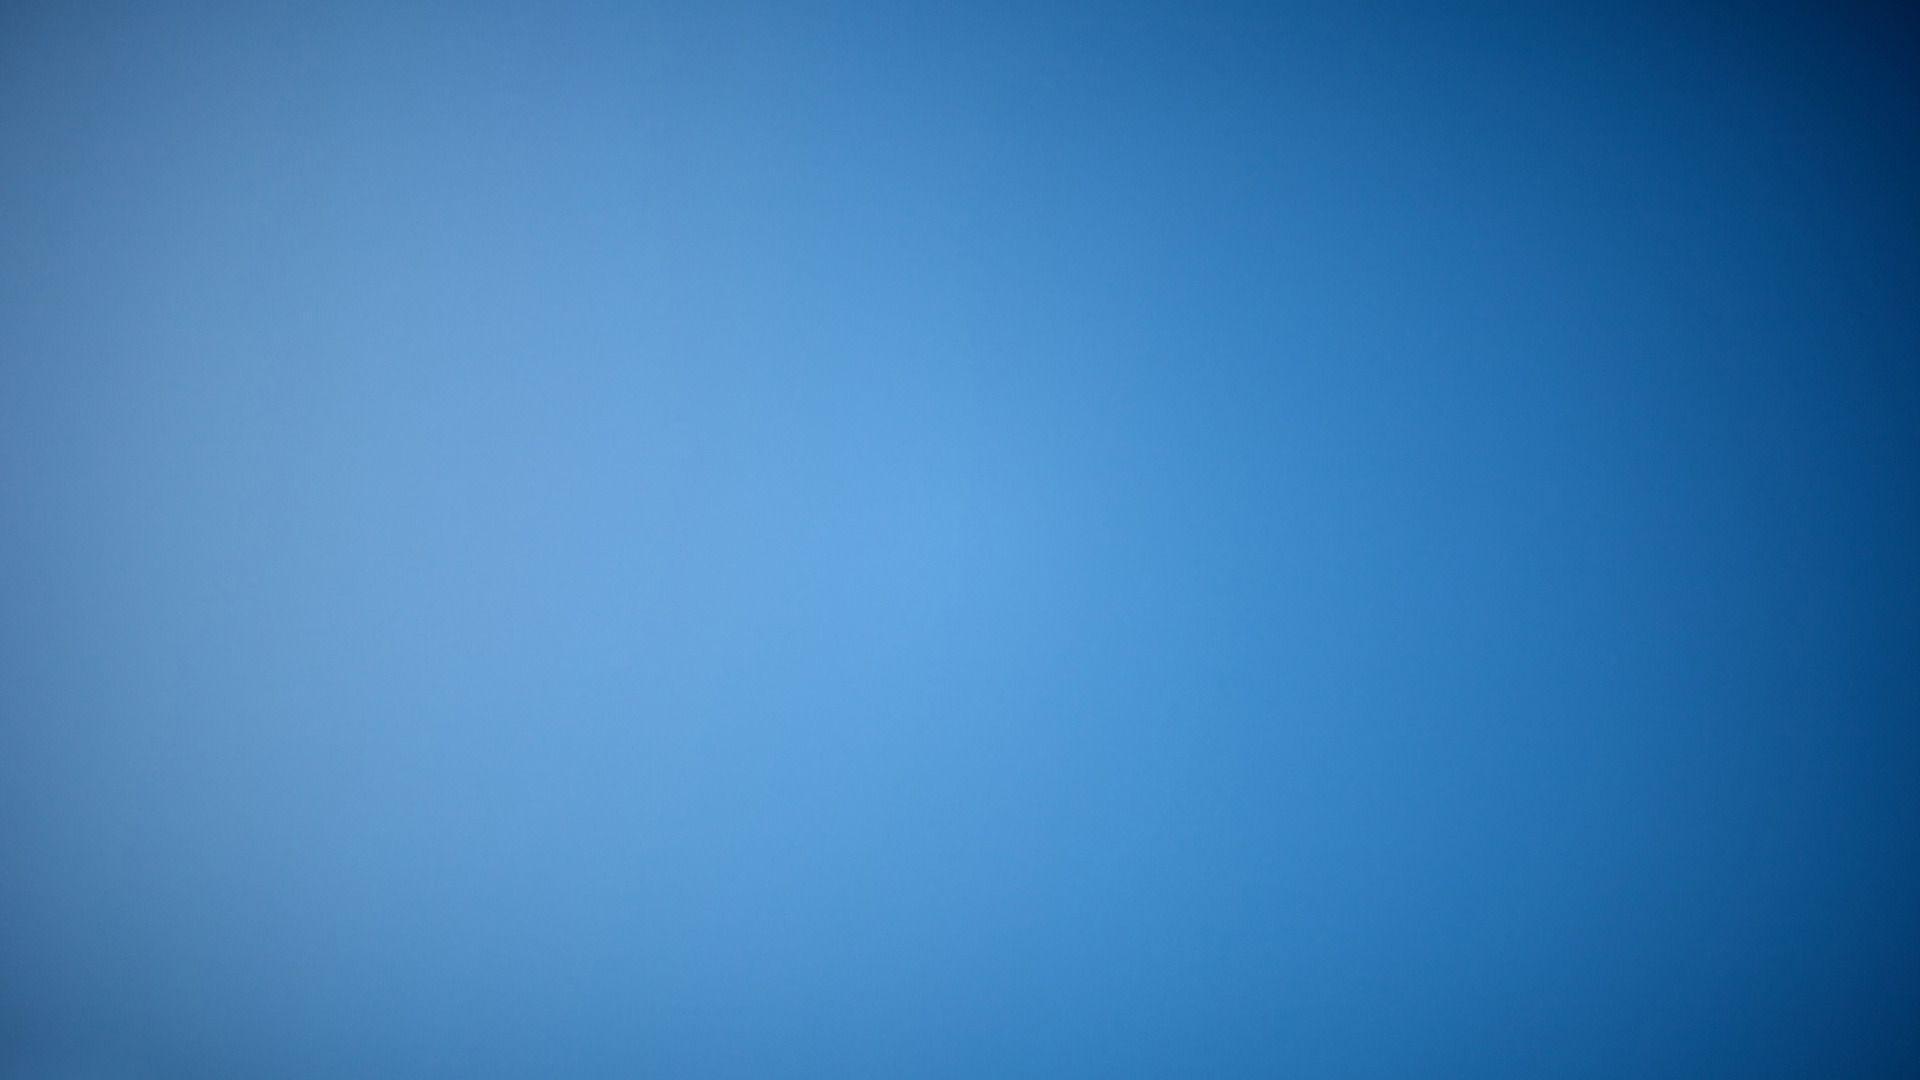 wallpaper background gradient blue - photo #3